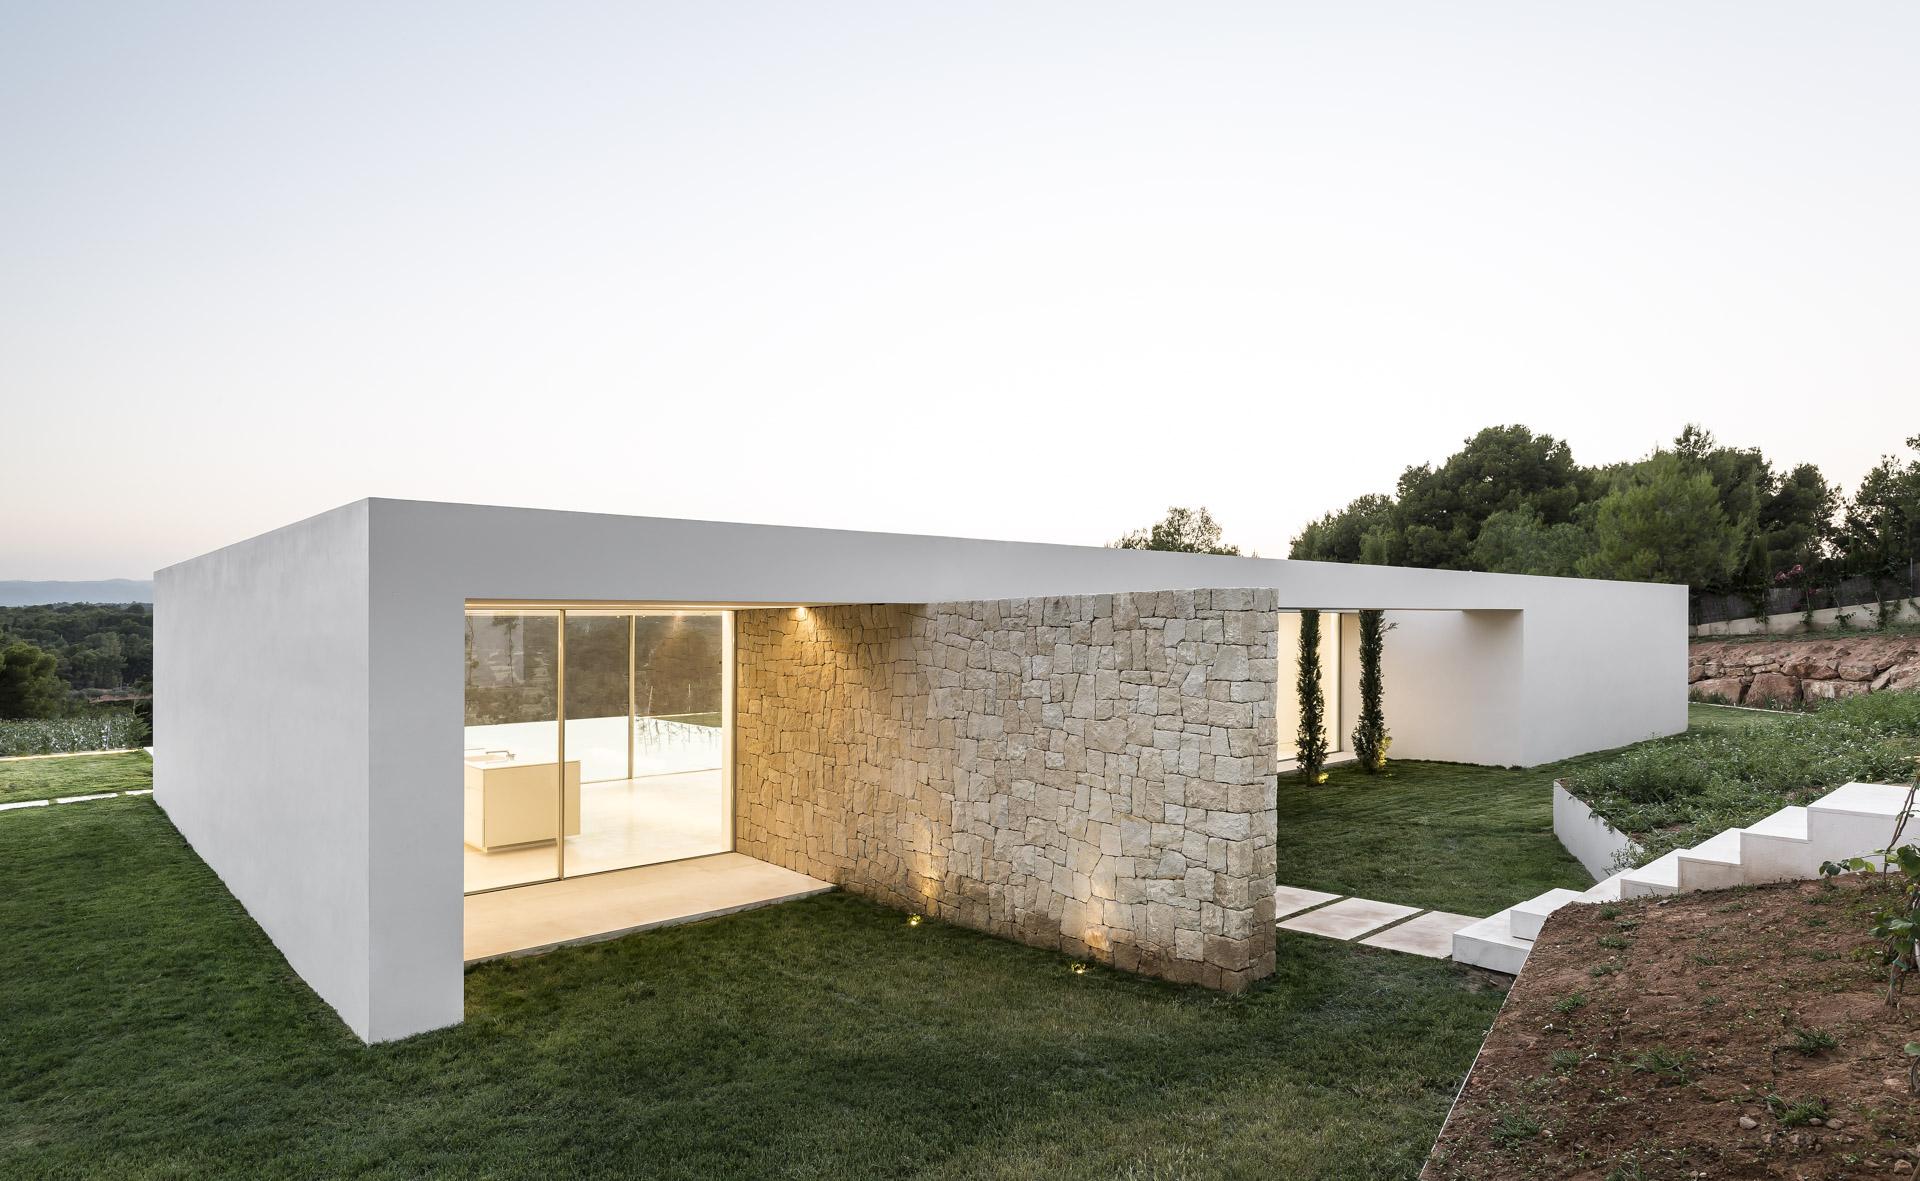 fotografia-arquitectura-valencia-german-cabo-gallardo-llopis-villamarchante-vivienda-54